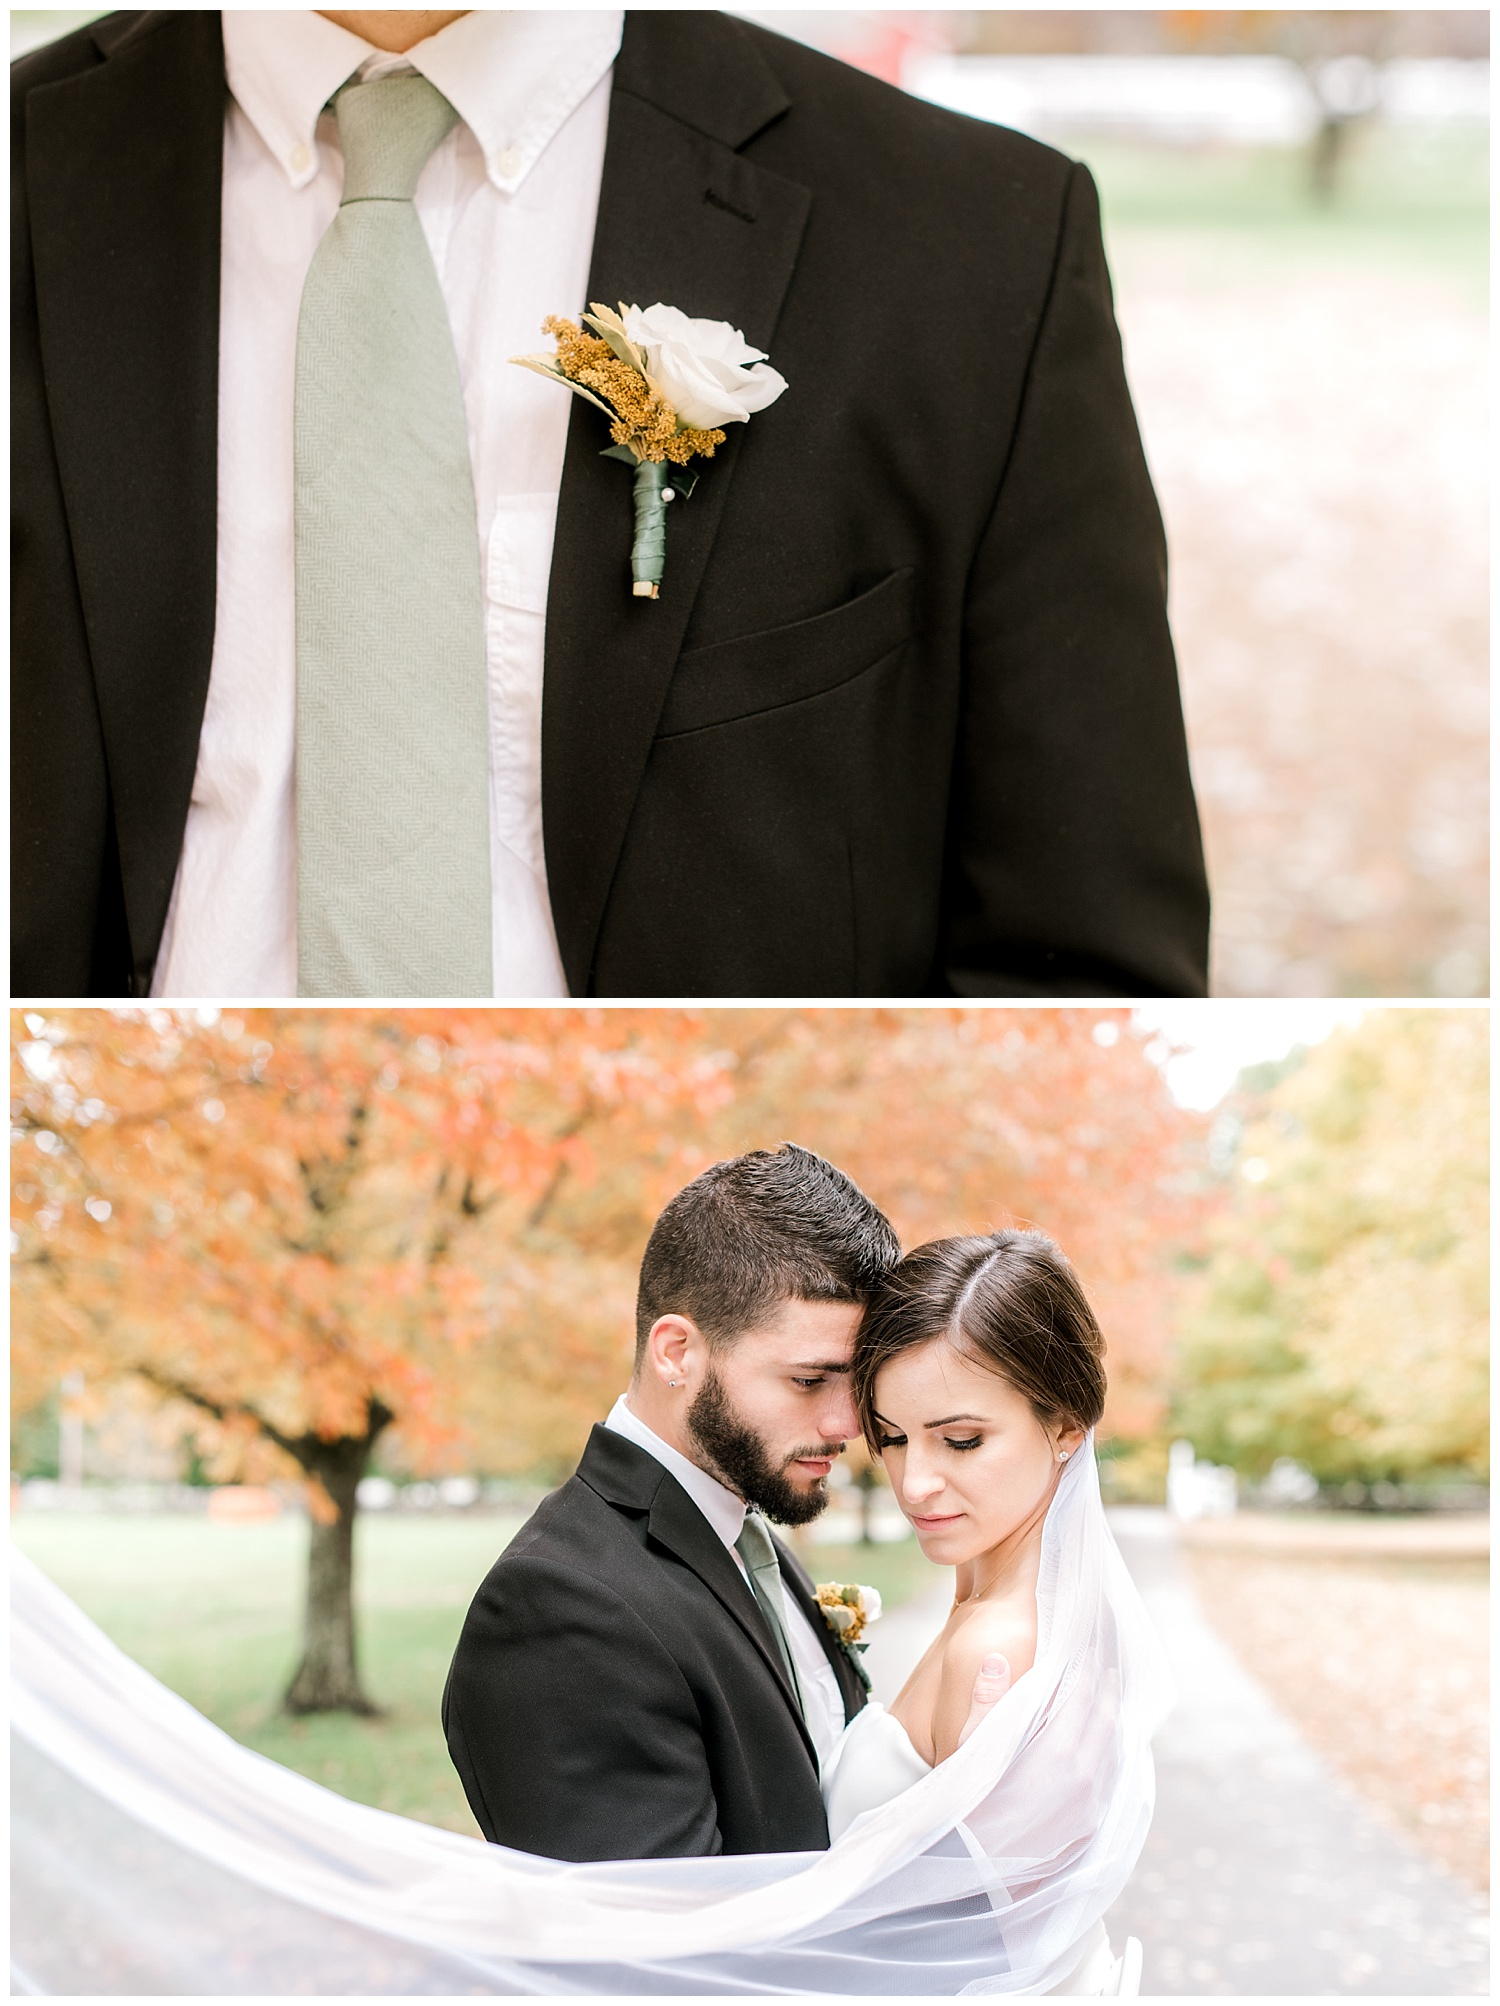 pompositticut-farm-fall-wedding-photography-hudson-massachusetts-photo-15.jpg